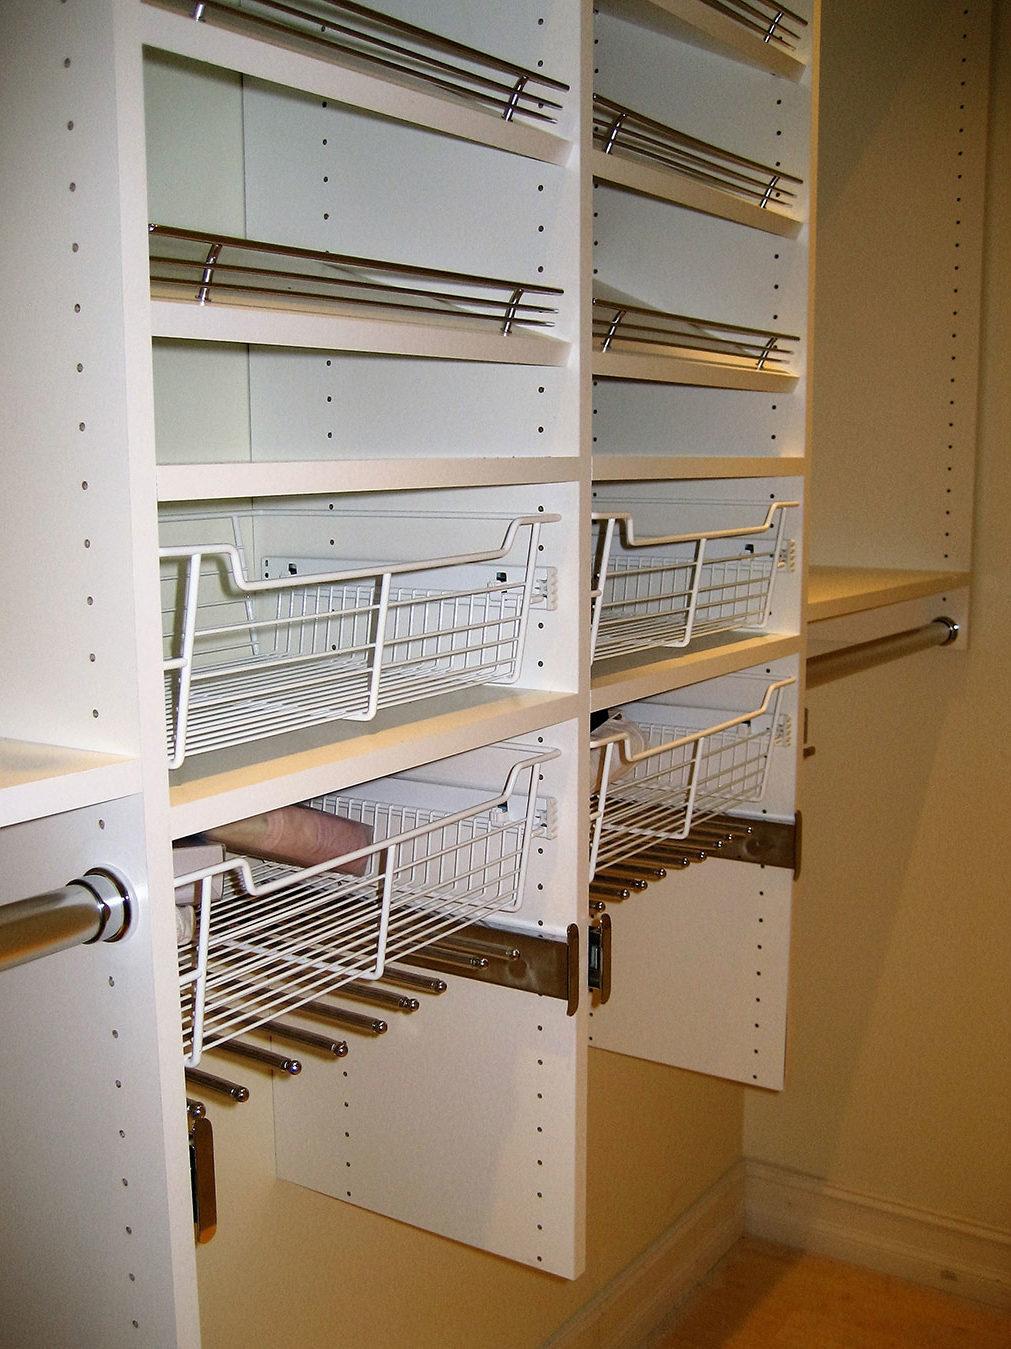 Closet Systems – Handyman Services Gainesville, FL – Dr. House, LLC